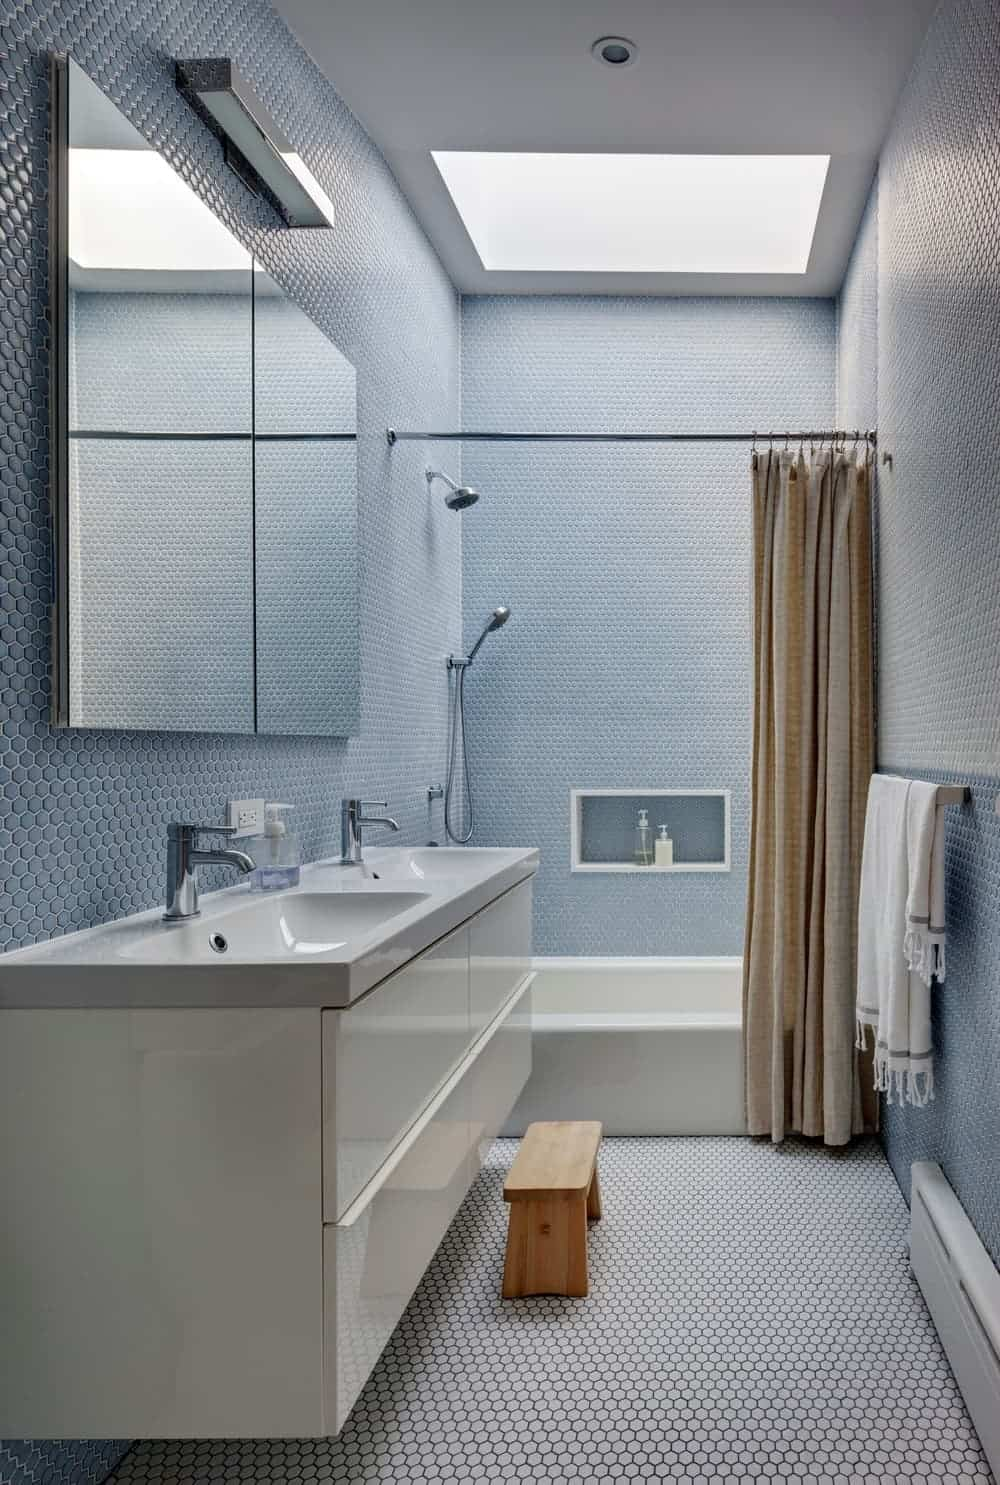 33 Terrific Small Primary Bathroom Ideas (2020 Photos) on Small Bathroom Ideas 2020 id=26971